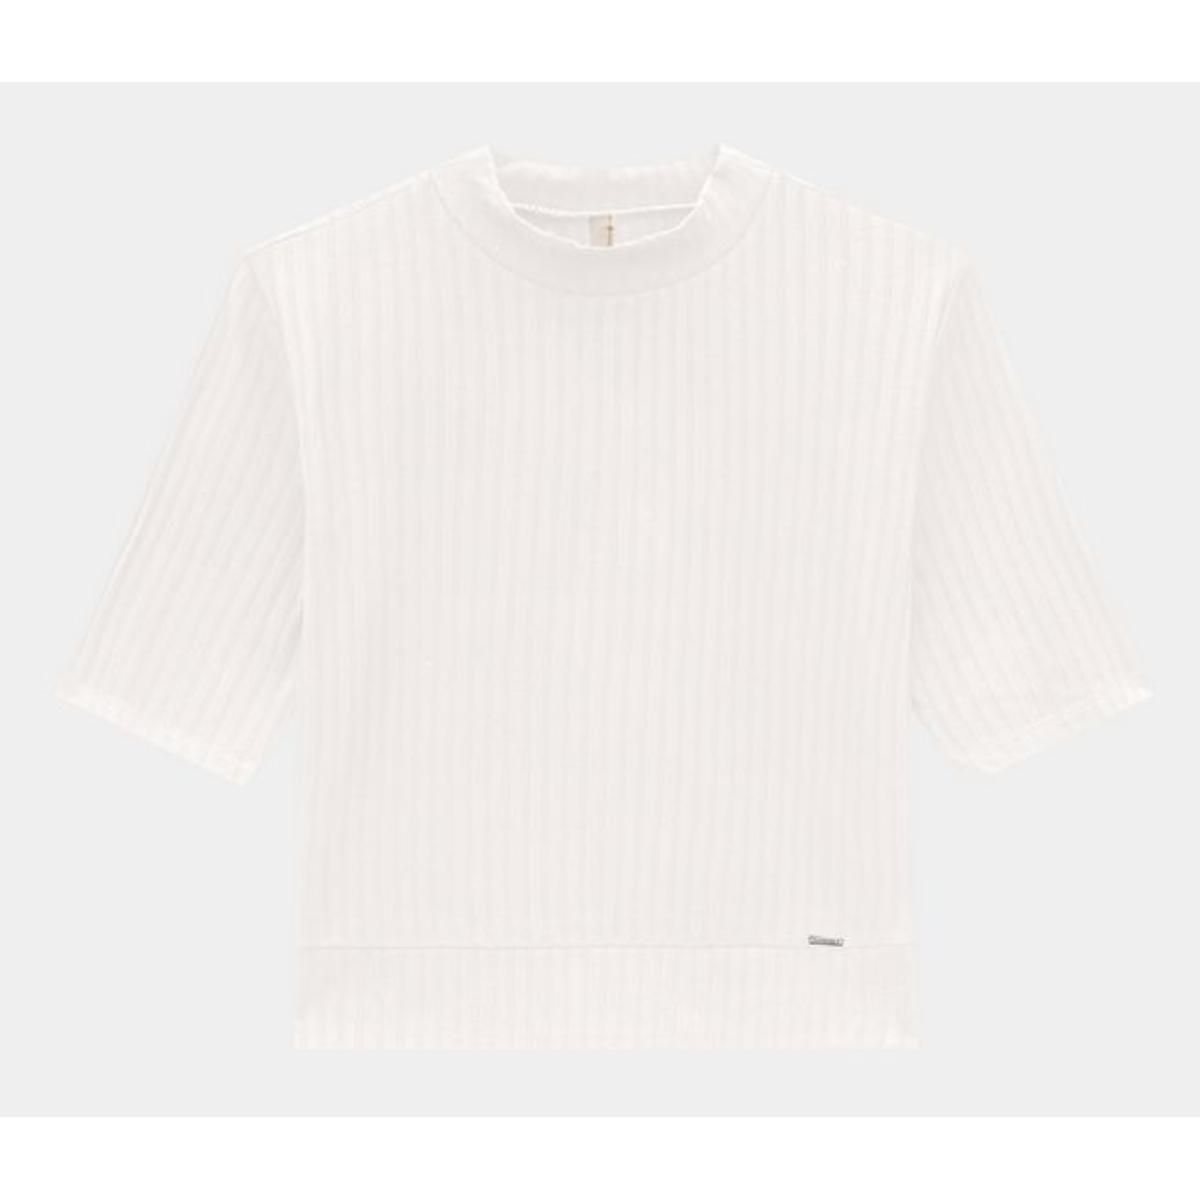 Blusa Feminina Lunender 60072 Branco